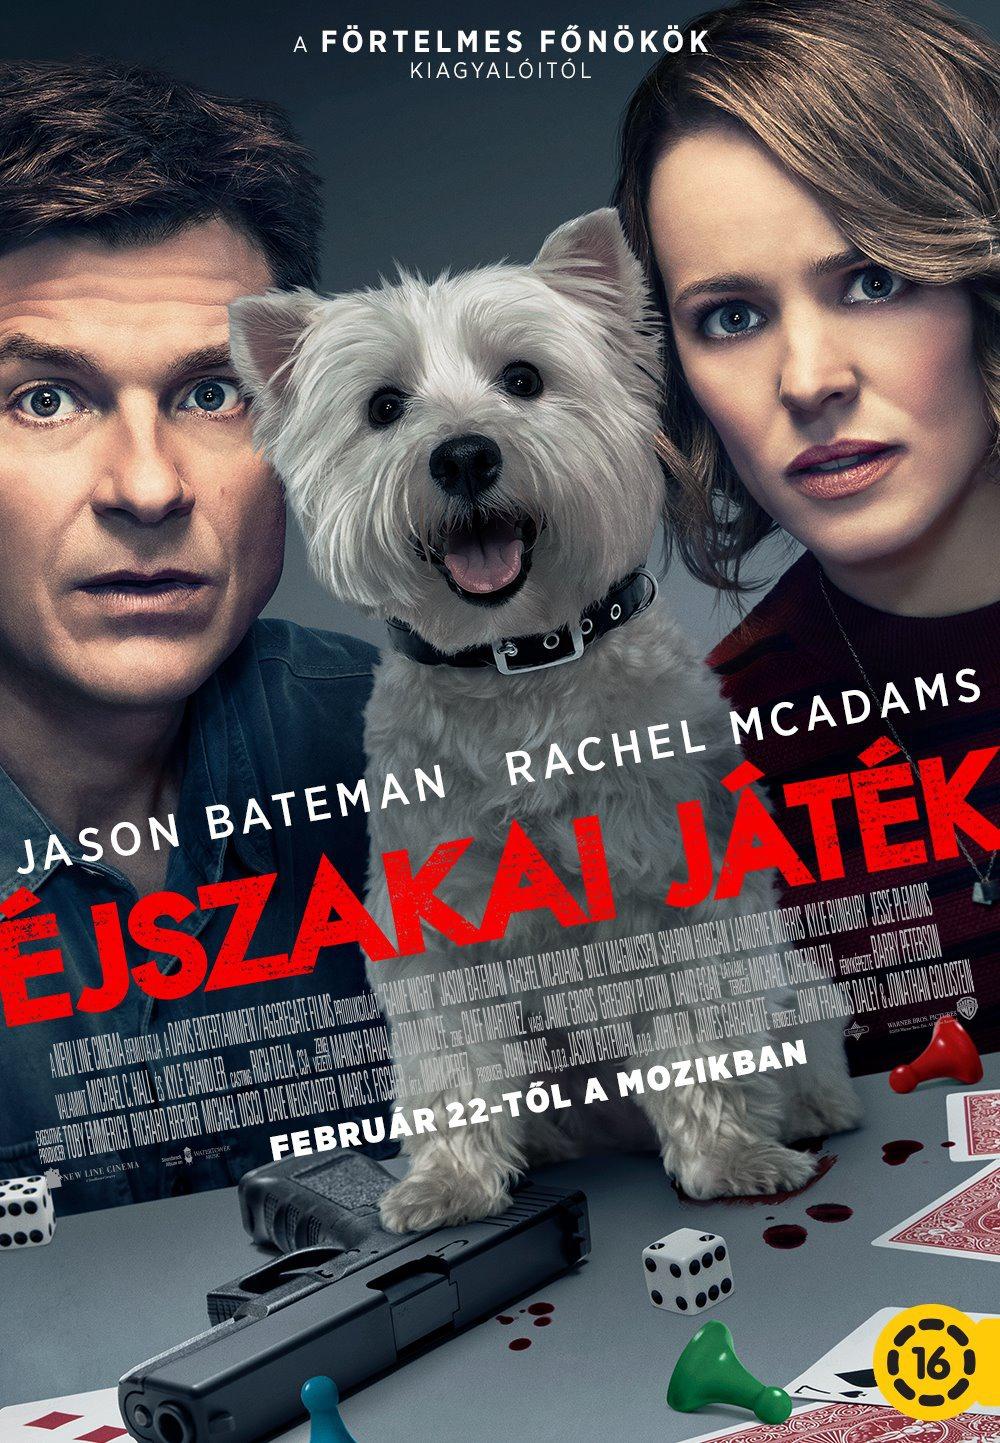 Game Night Trailer 2 (2018) Rachel McAdams, Jason Bateman Comedy Movie HD   Official Trailer  История Макса и Энни, которые вместе с другими парами  каждую ... baae90a998a